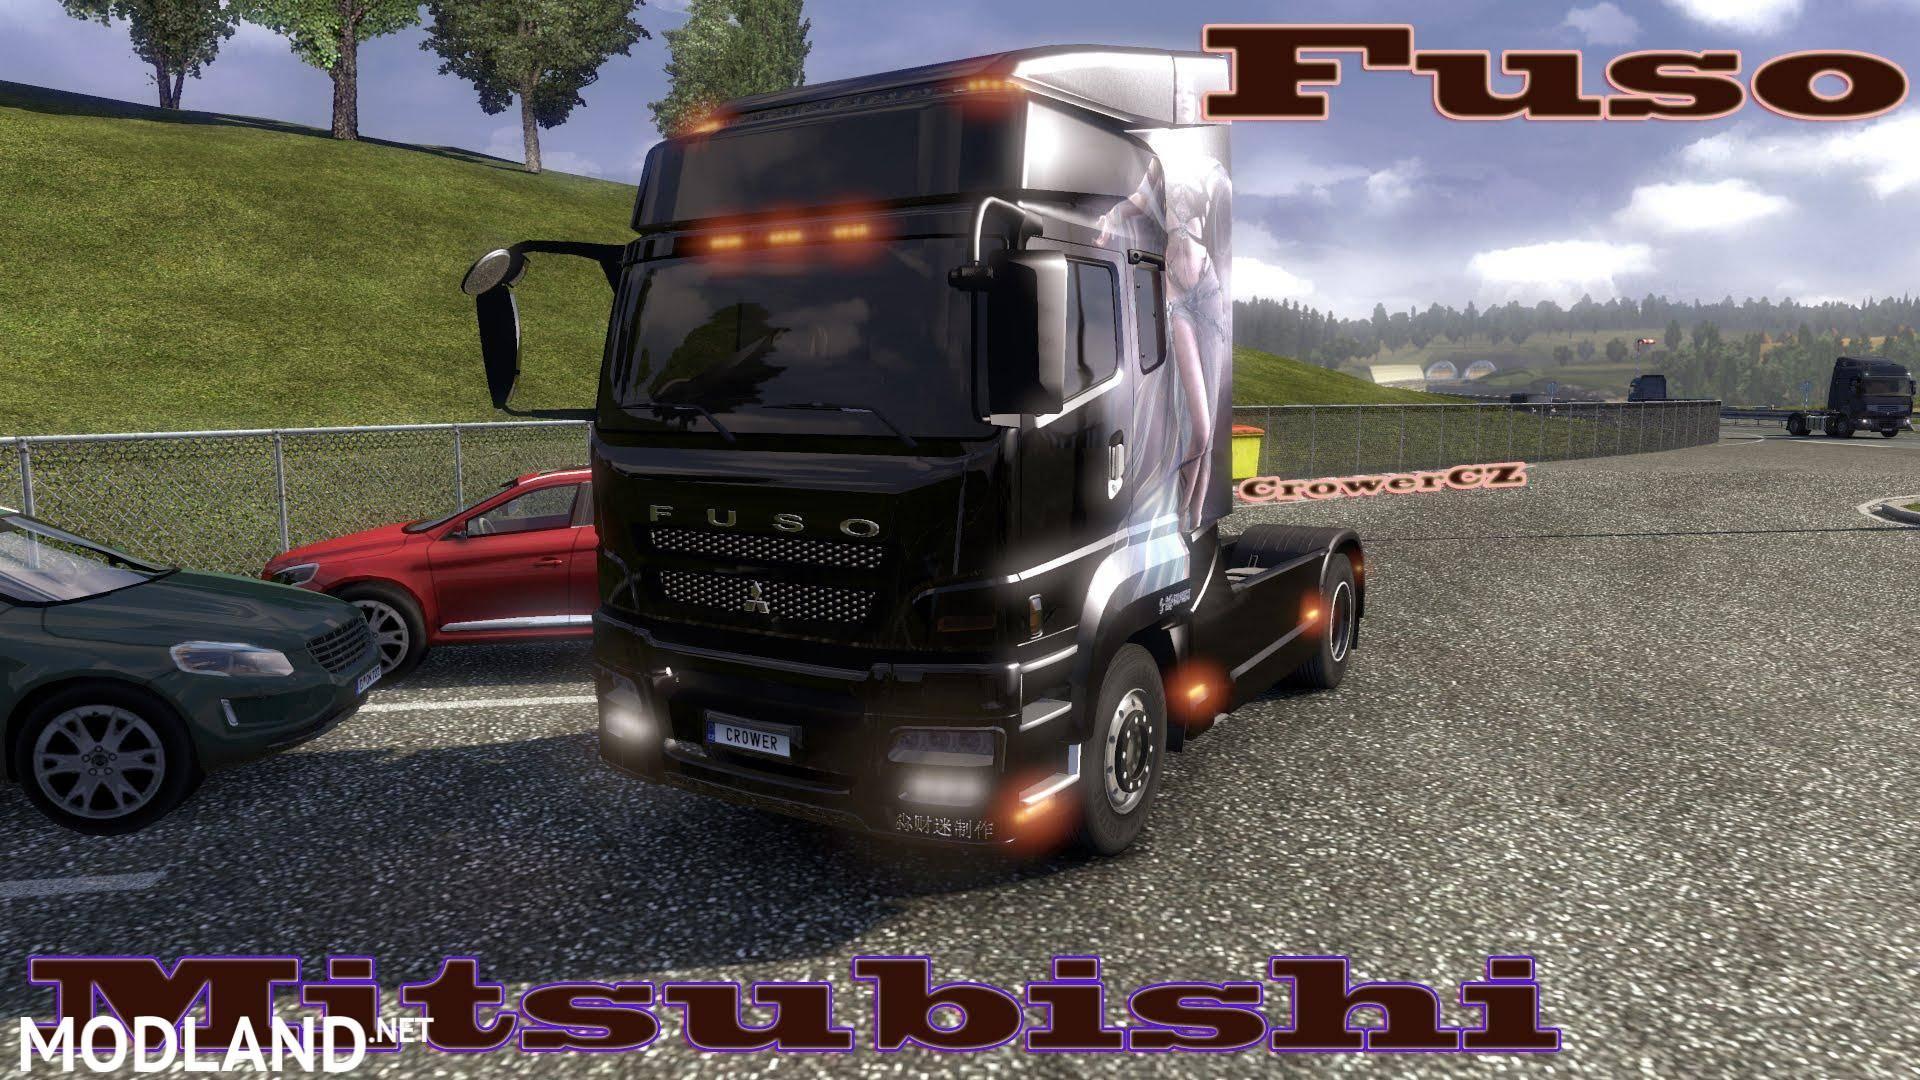 Mitsubishi Fuso mod for ETS 2